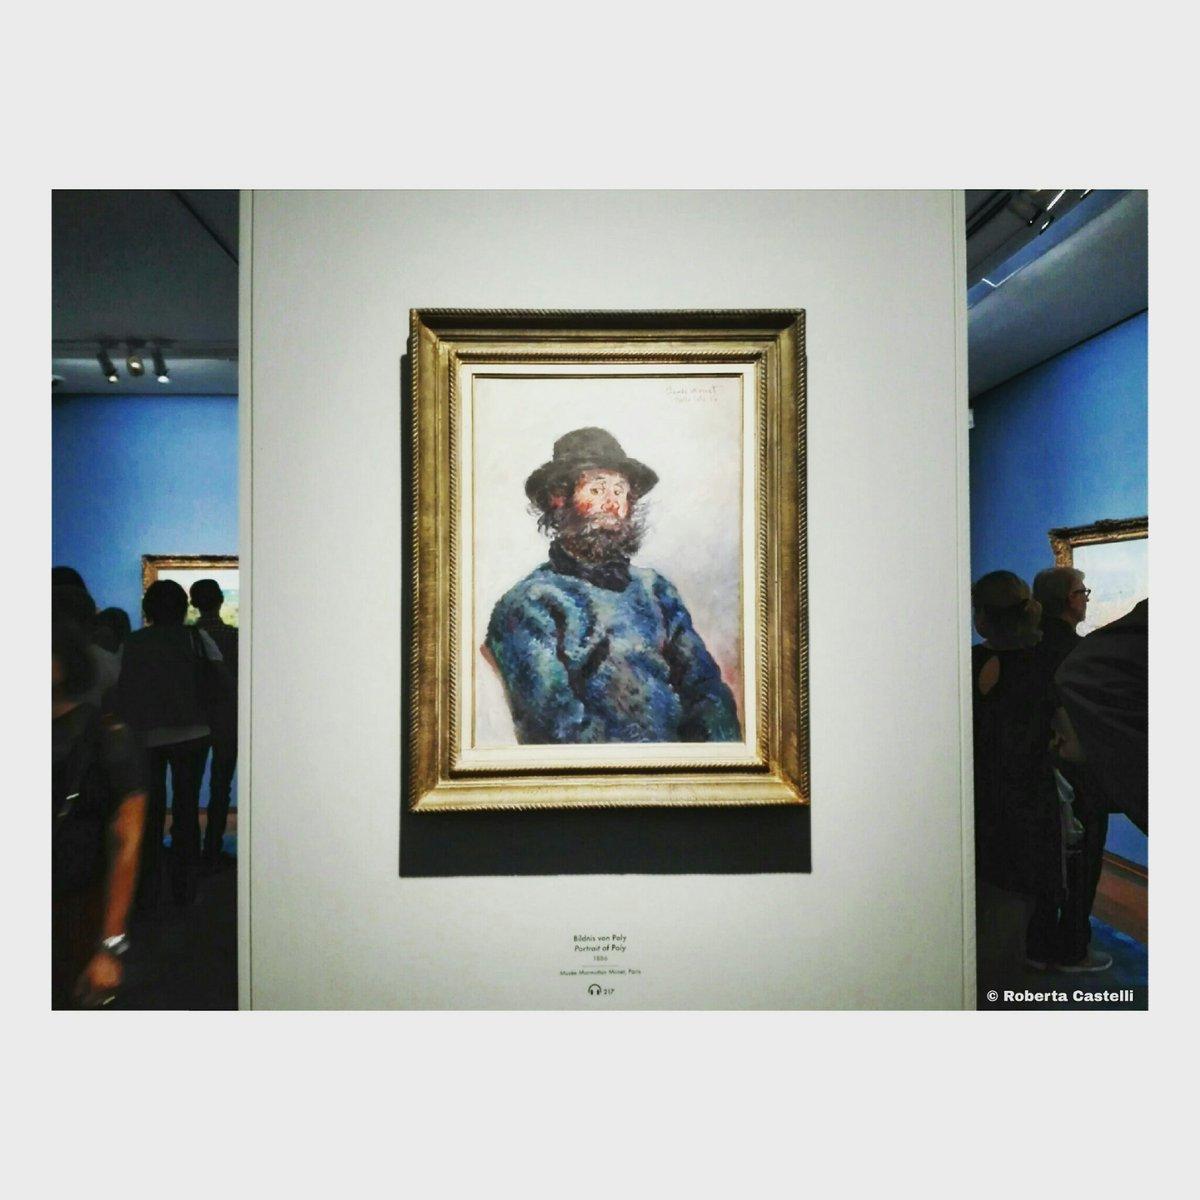 Altro giro, altra mostra... #Monet #Vienna #art @AlbertinaMuseum #photography @Mjkj23_   - Ukustom